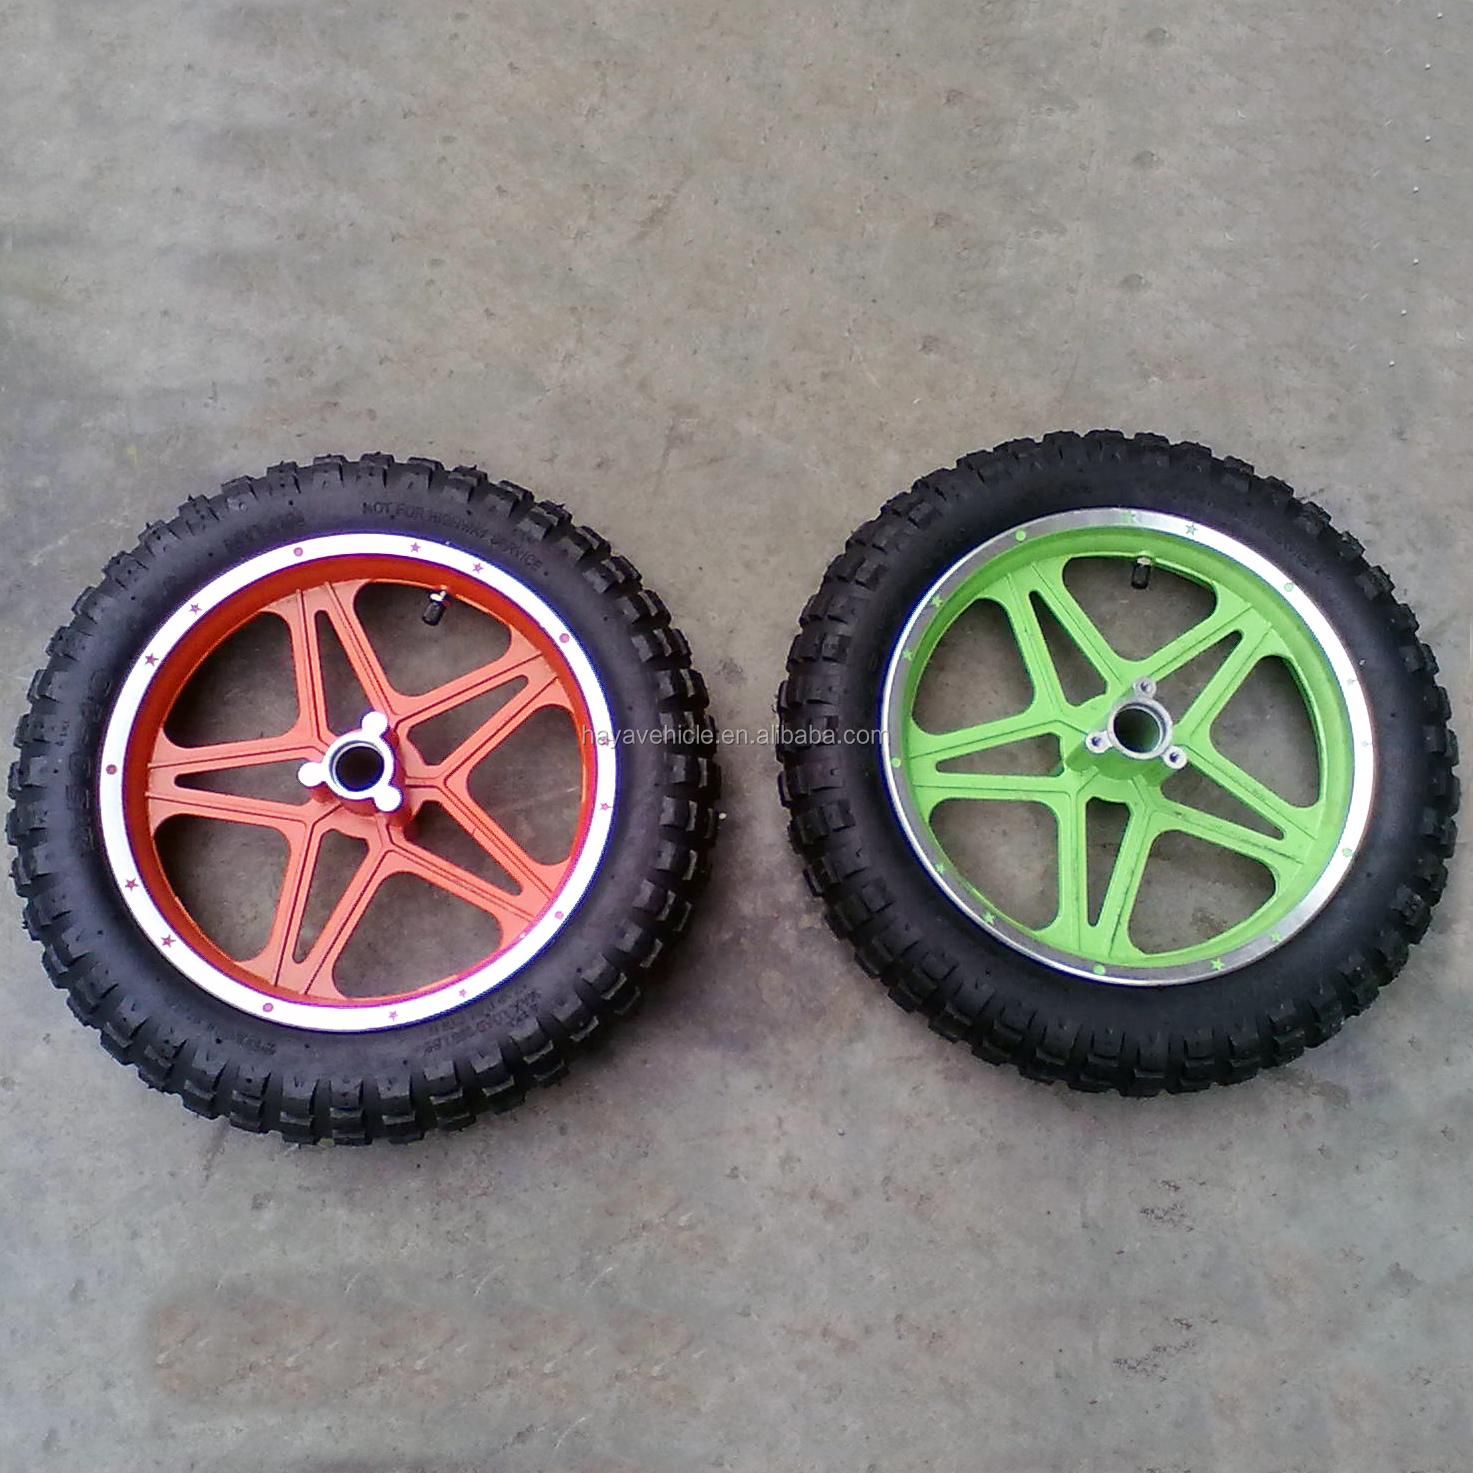 Wheels For Mini Pocket Dirt Bike 2 50 10 Tires Buy Mini Dirt Bike Wheels Mini Dirt Bike Big Wheel Mini Dirt Bike Product On Alibaba Com